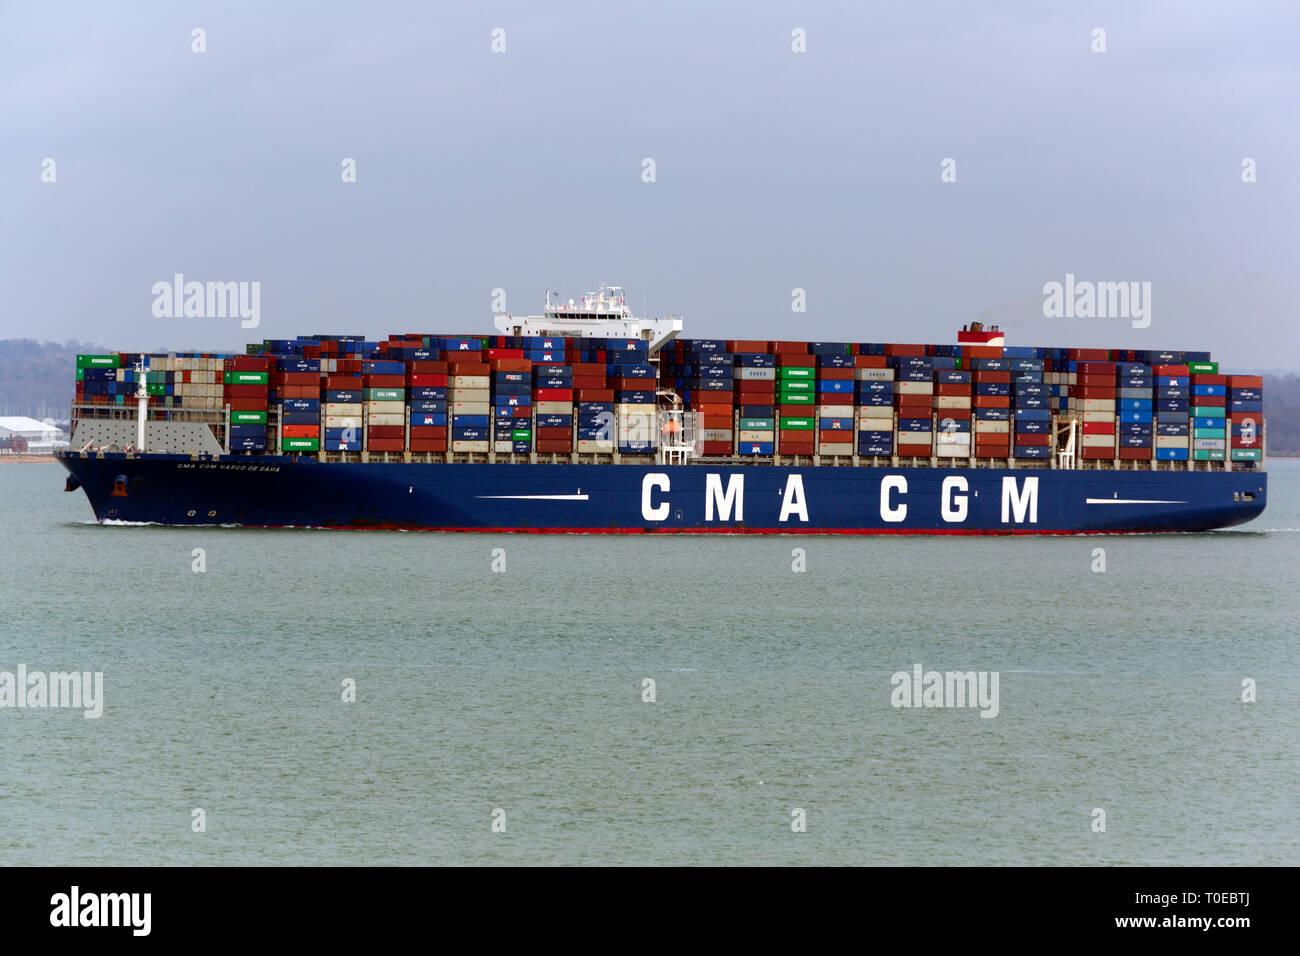 Cma Cgm Stock Photos & Cma Cgm Stock Images - Alamy